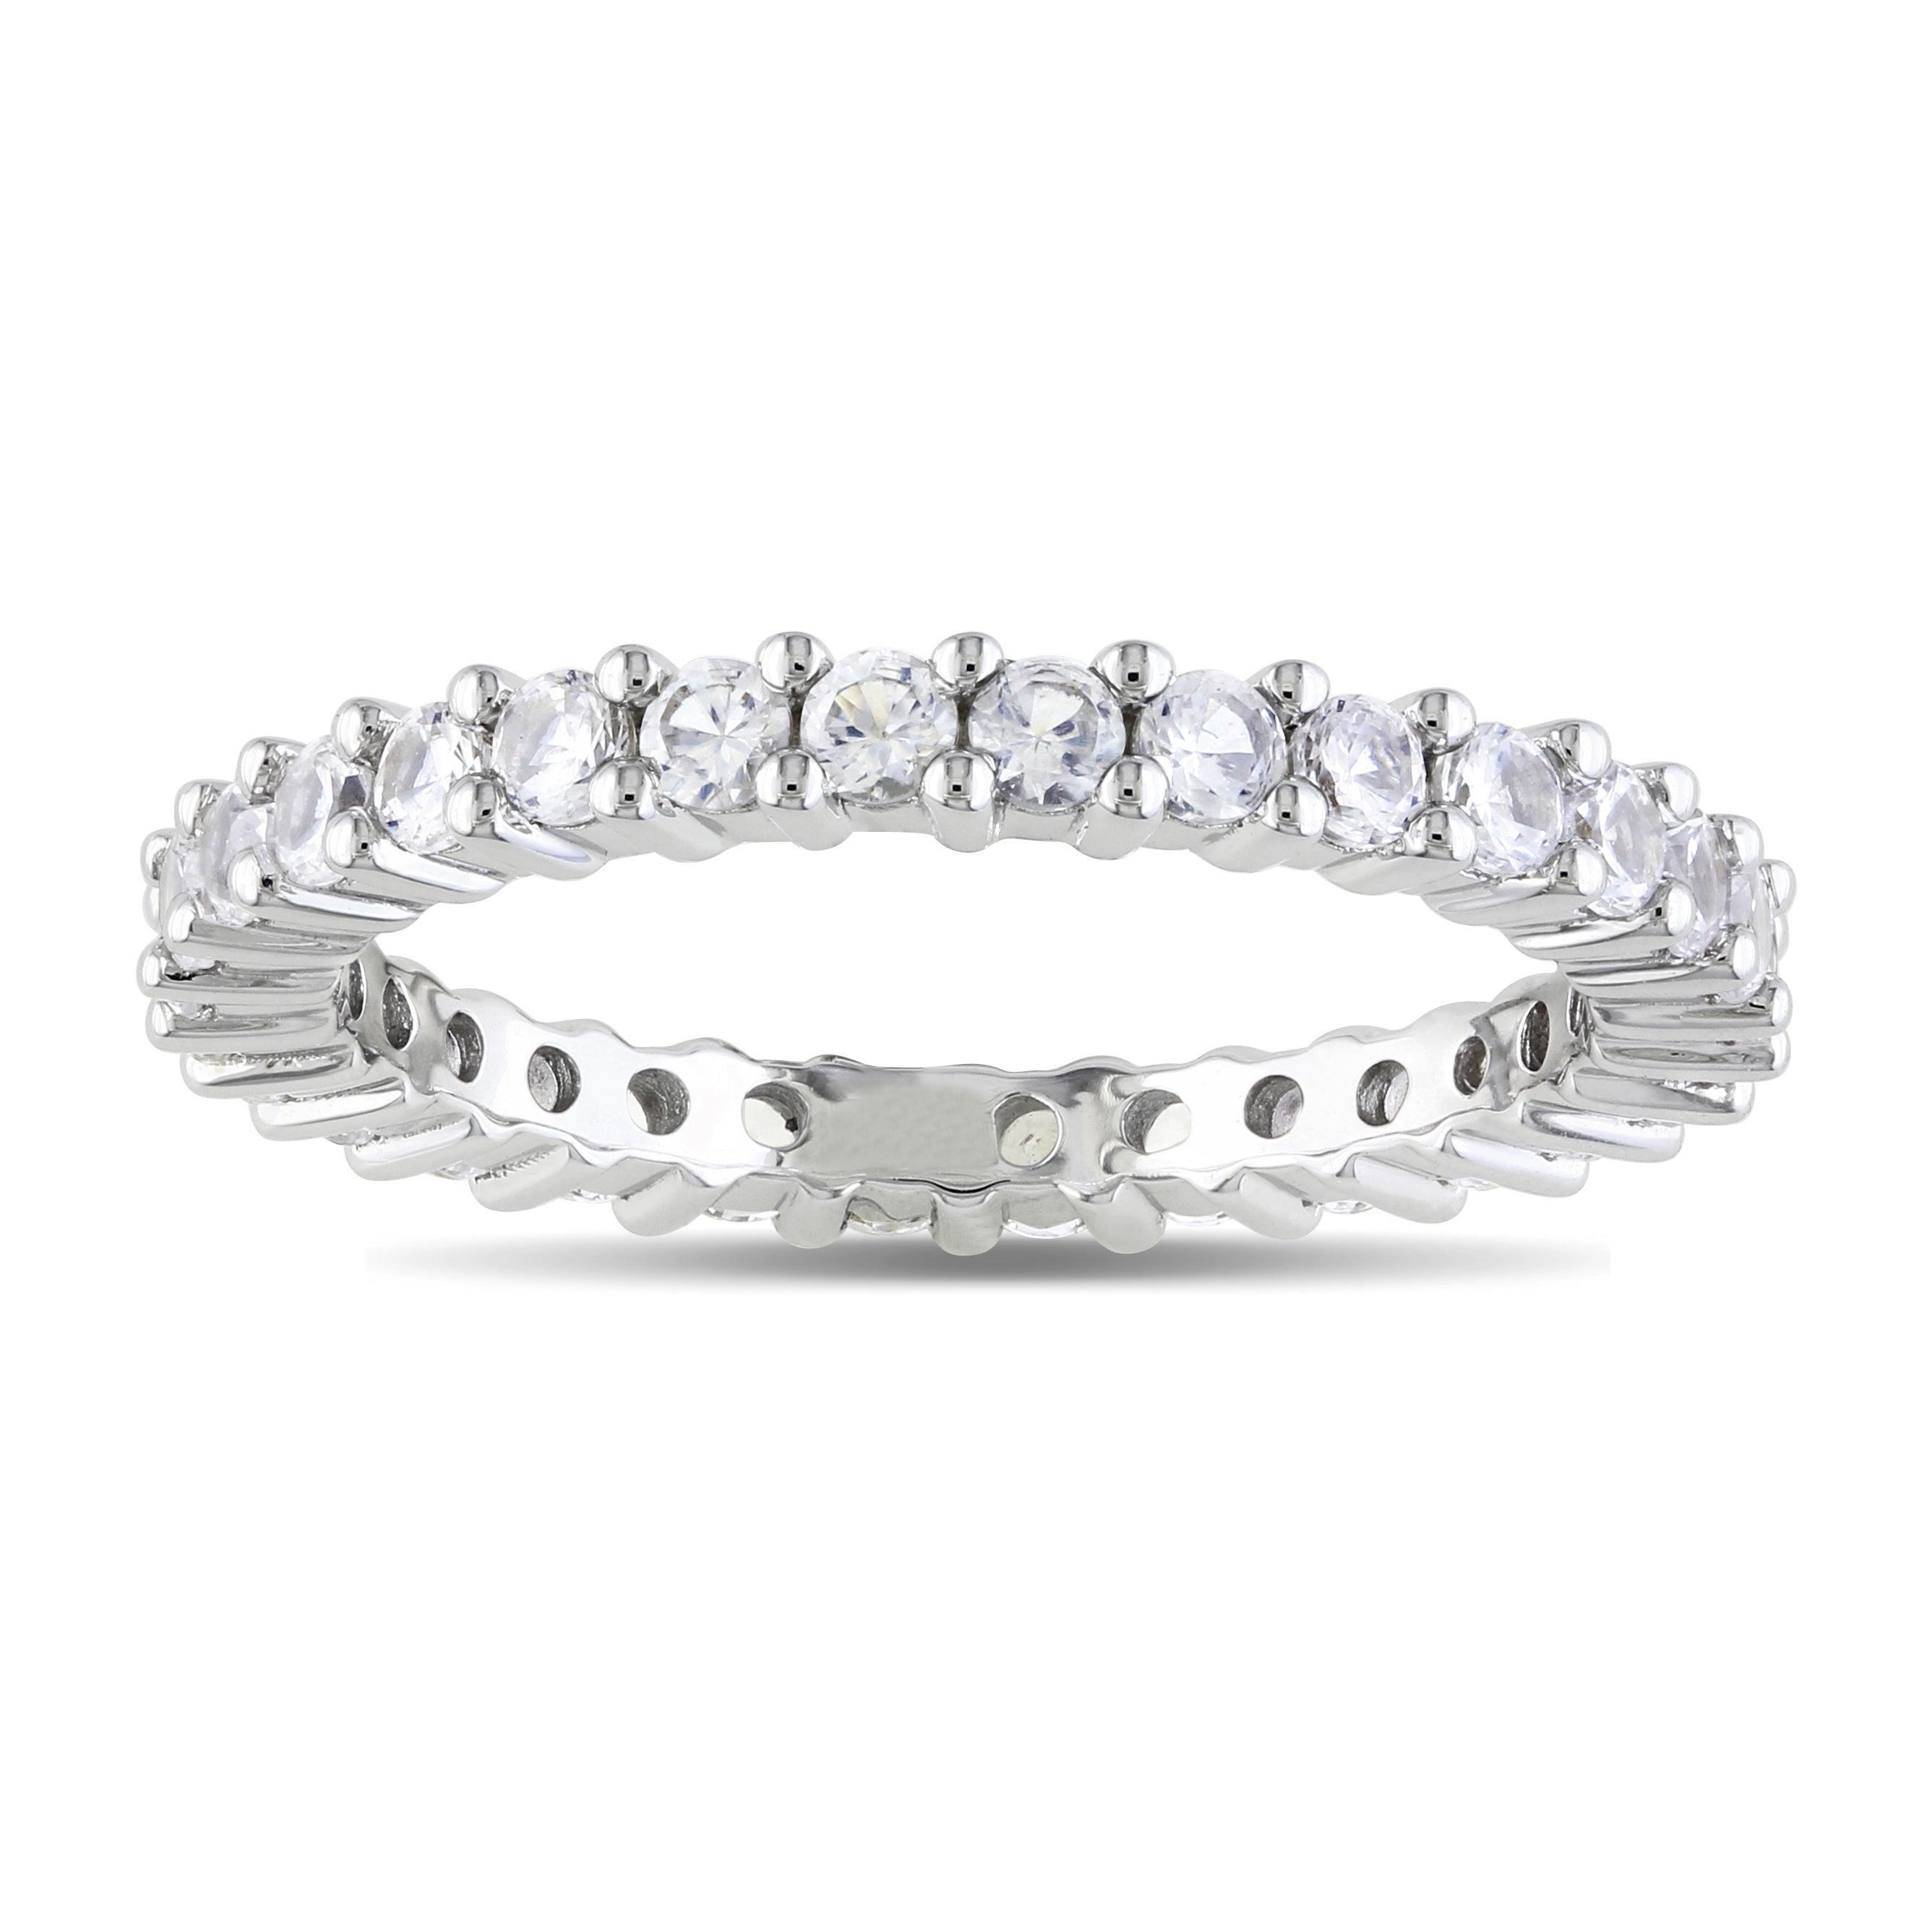 Miadora 10k White Gold 1 1/5 CT TGW Created White Sapphire Eternity Ring (Size 6)